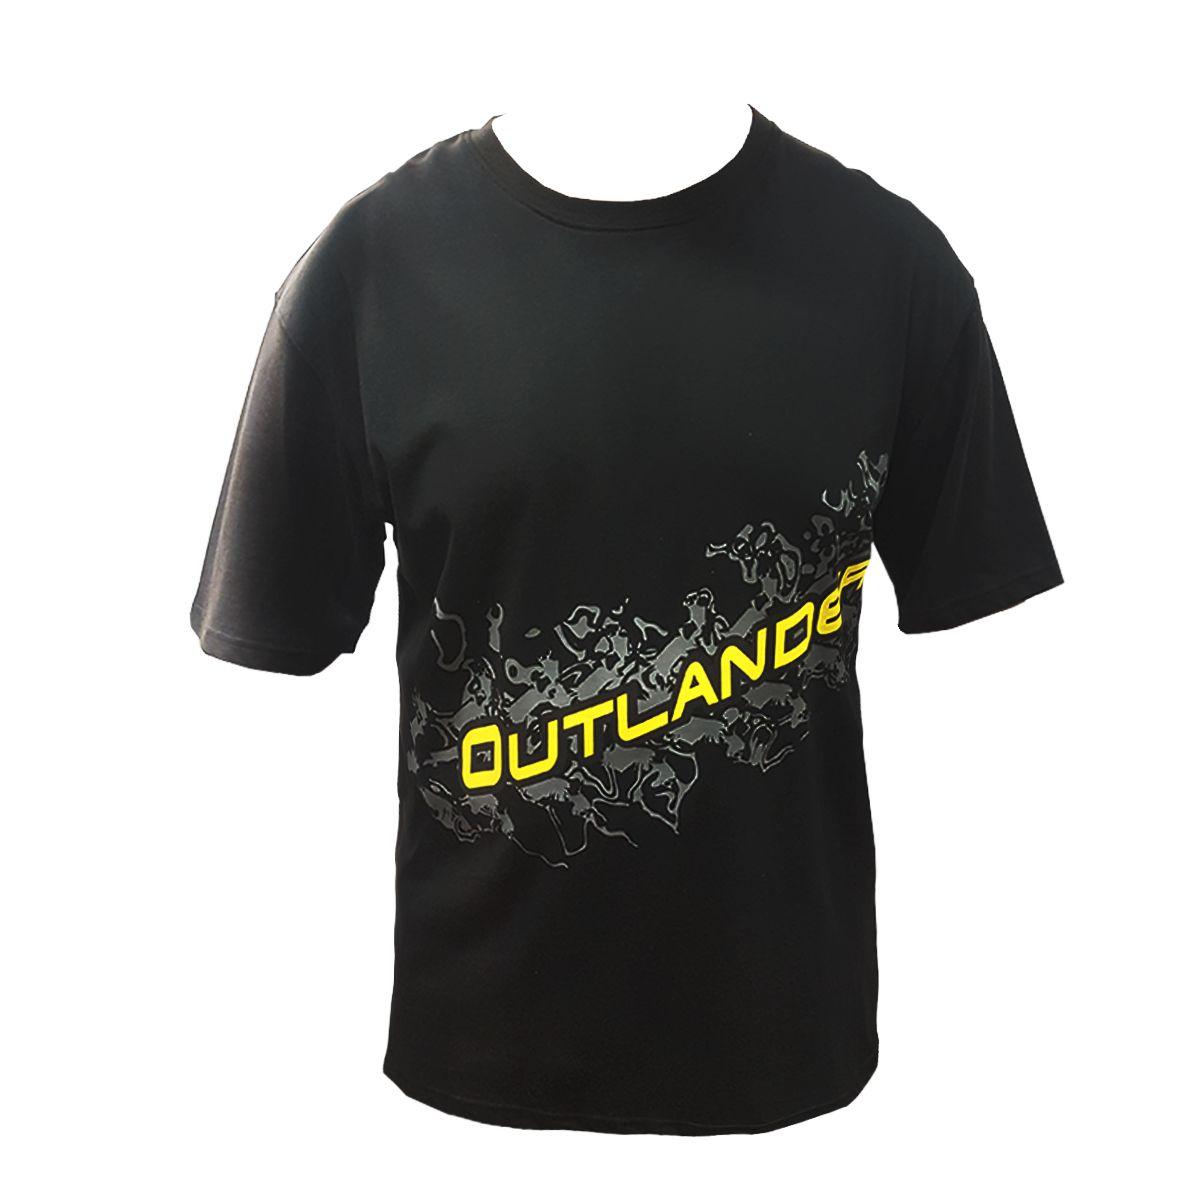 Camiseta Outlander Masculino Preto